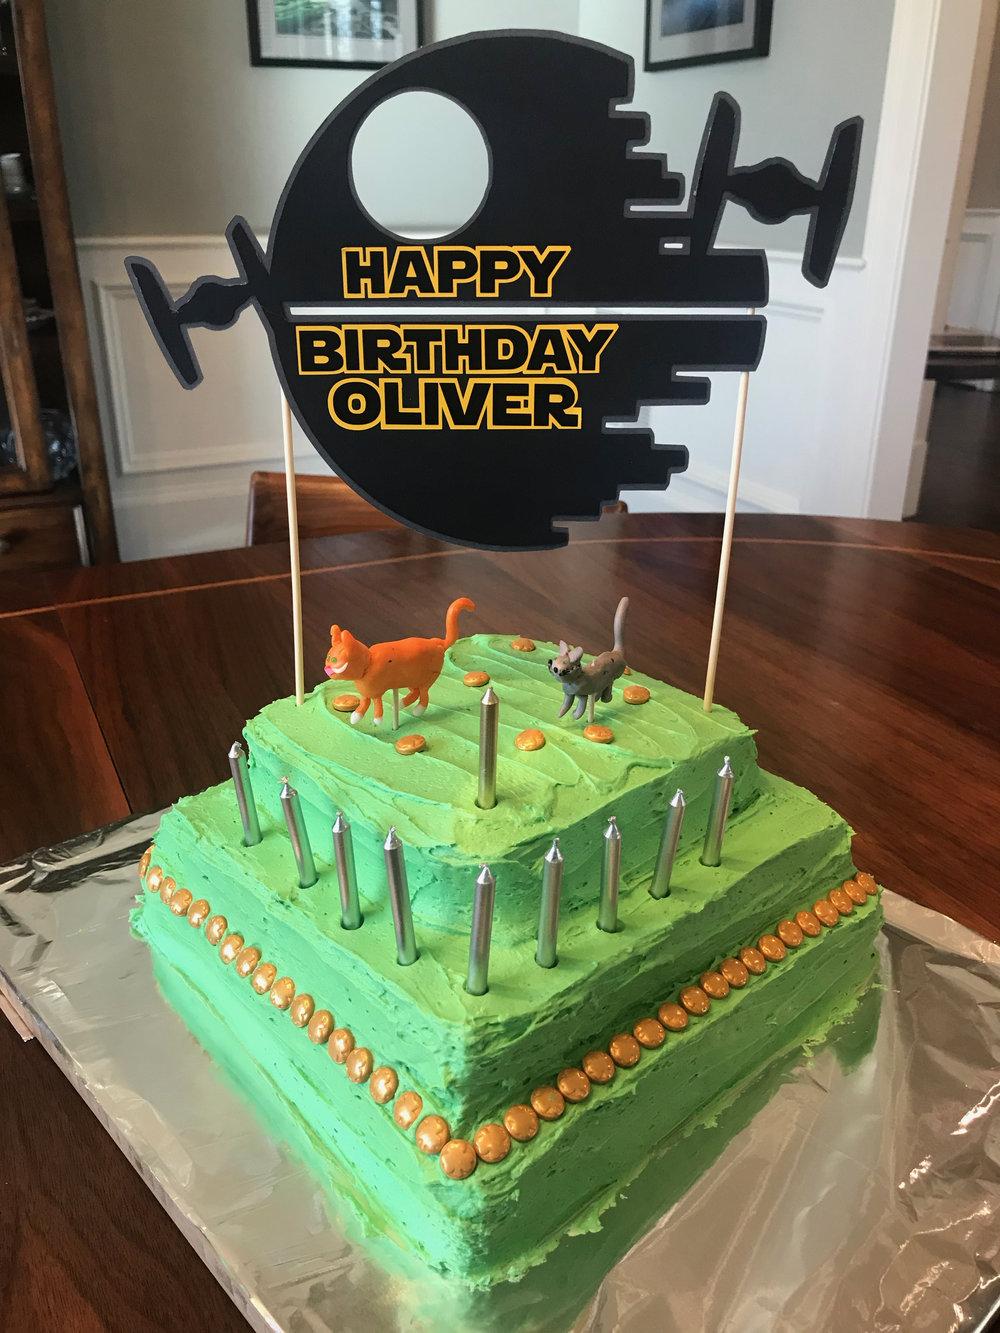 Ol's 10th birthday cake